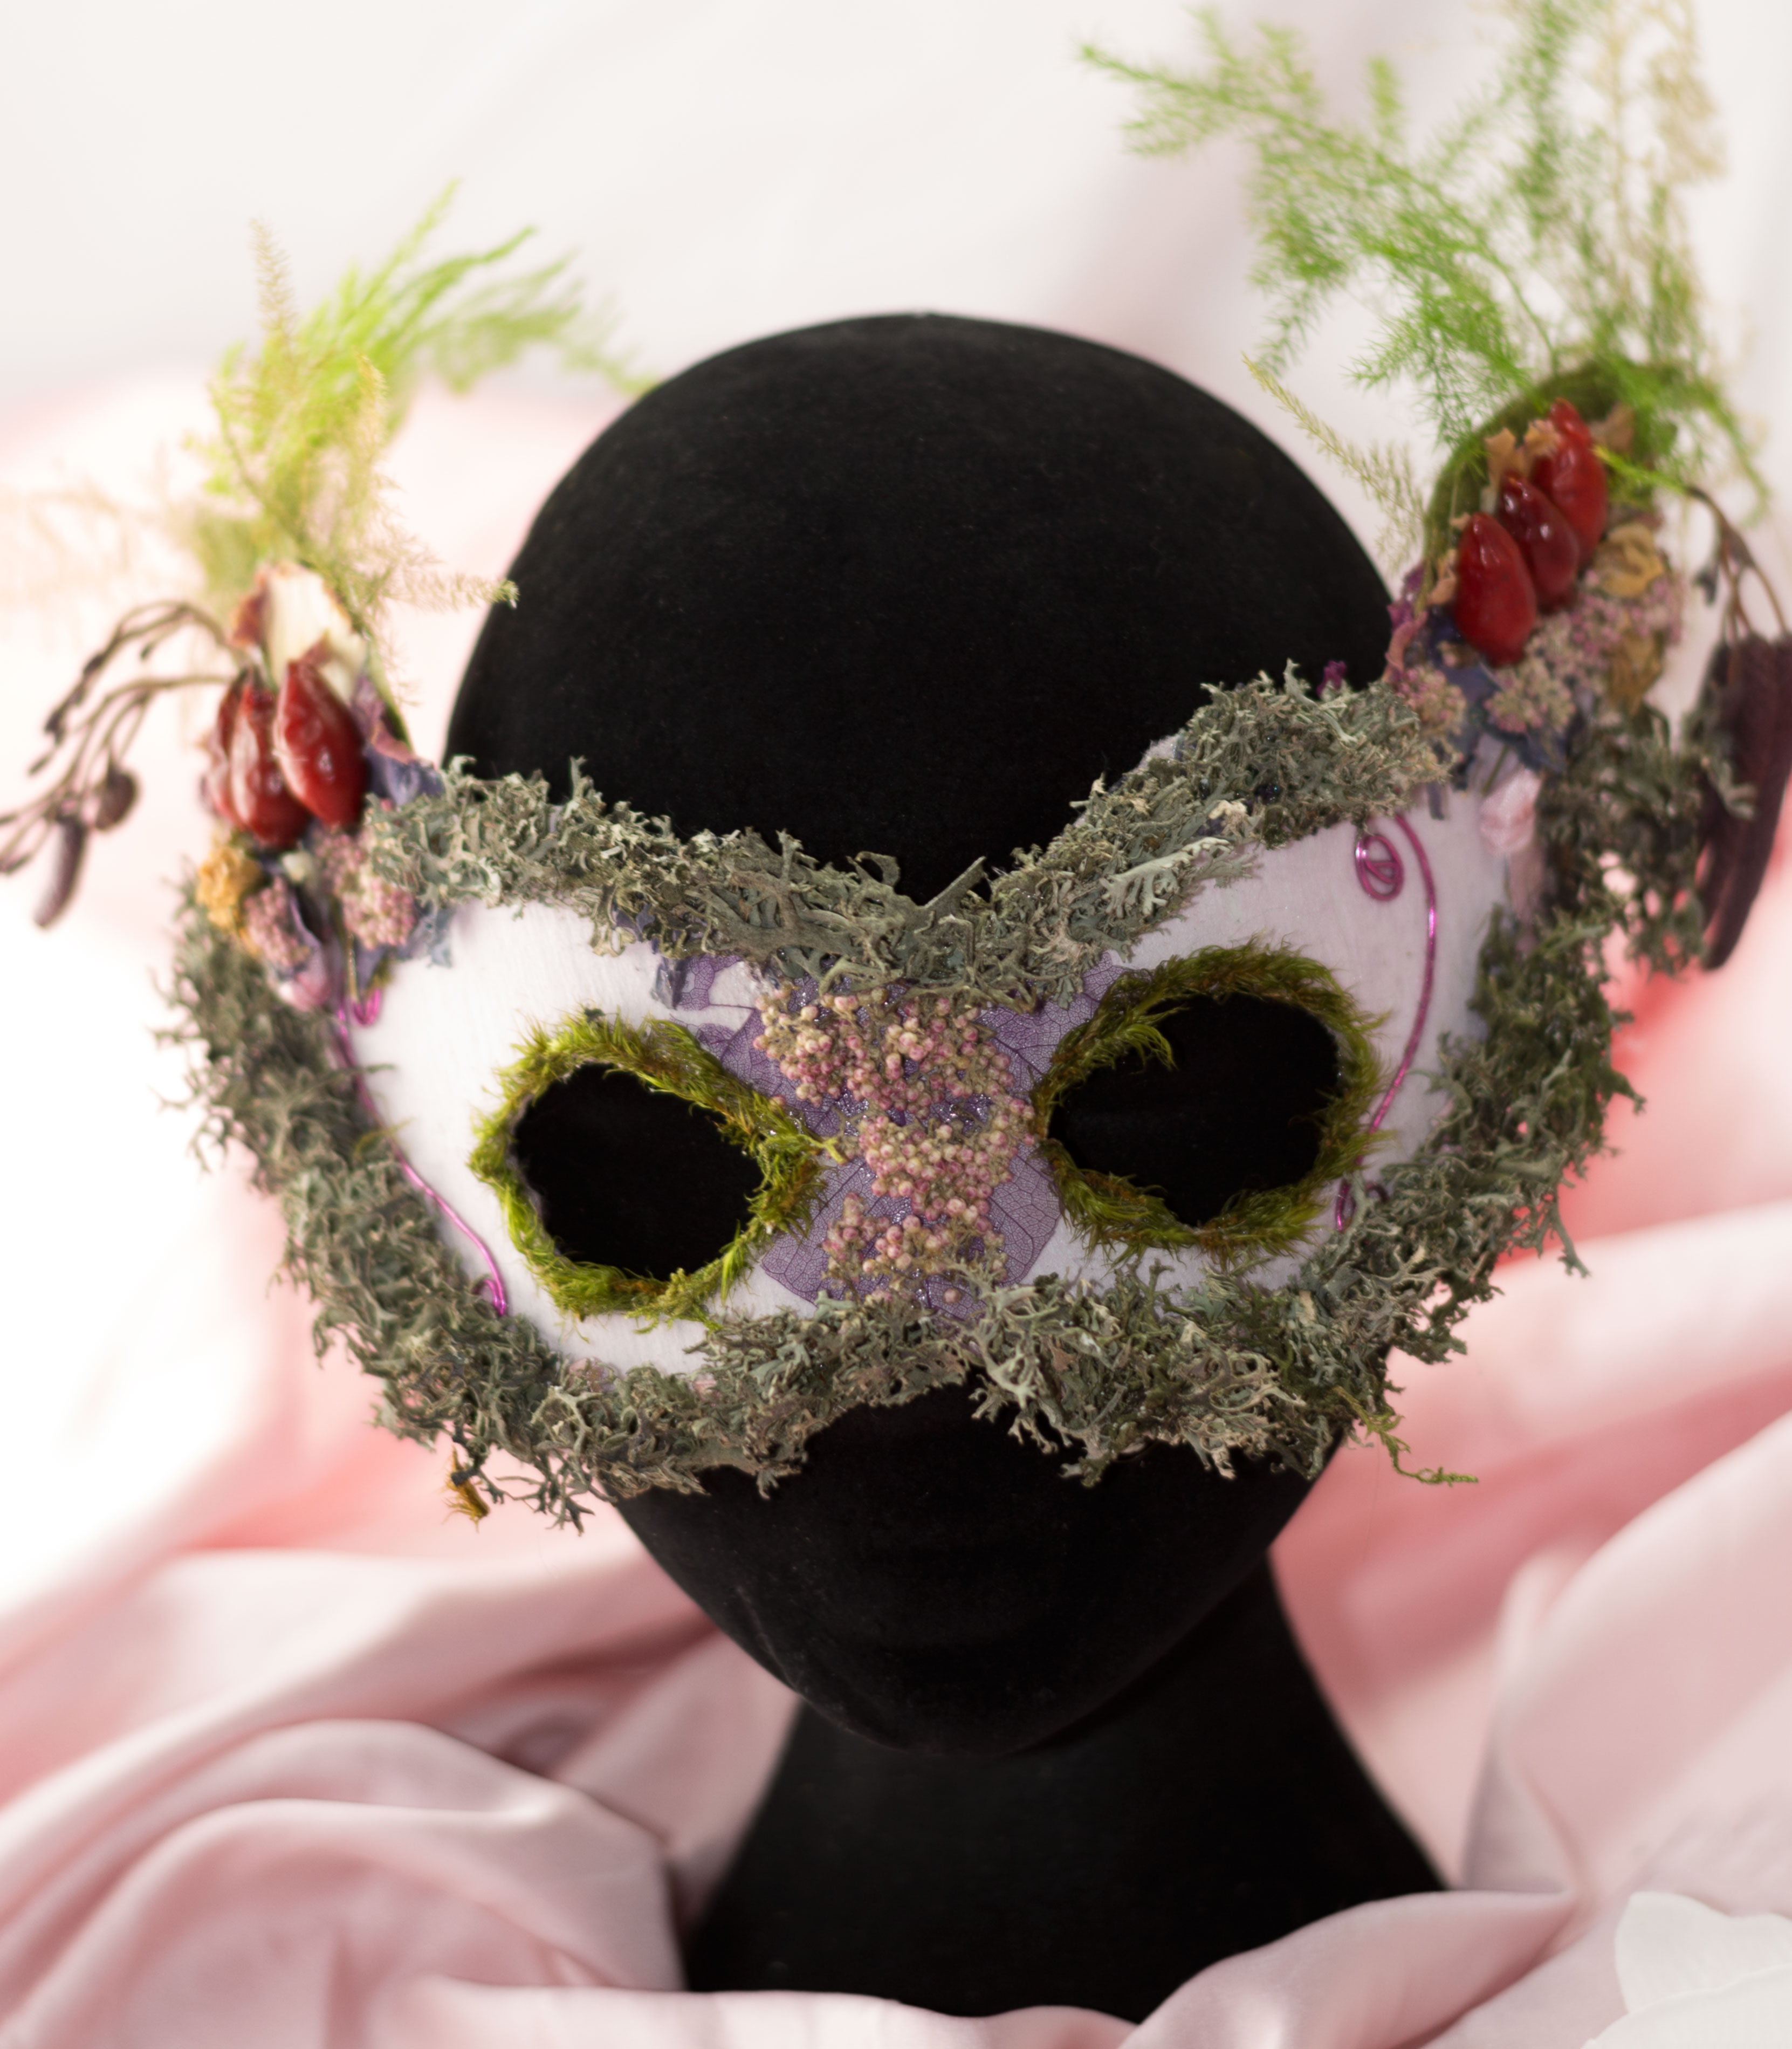 Masque végétal carnaval